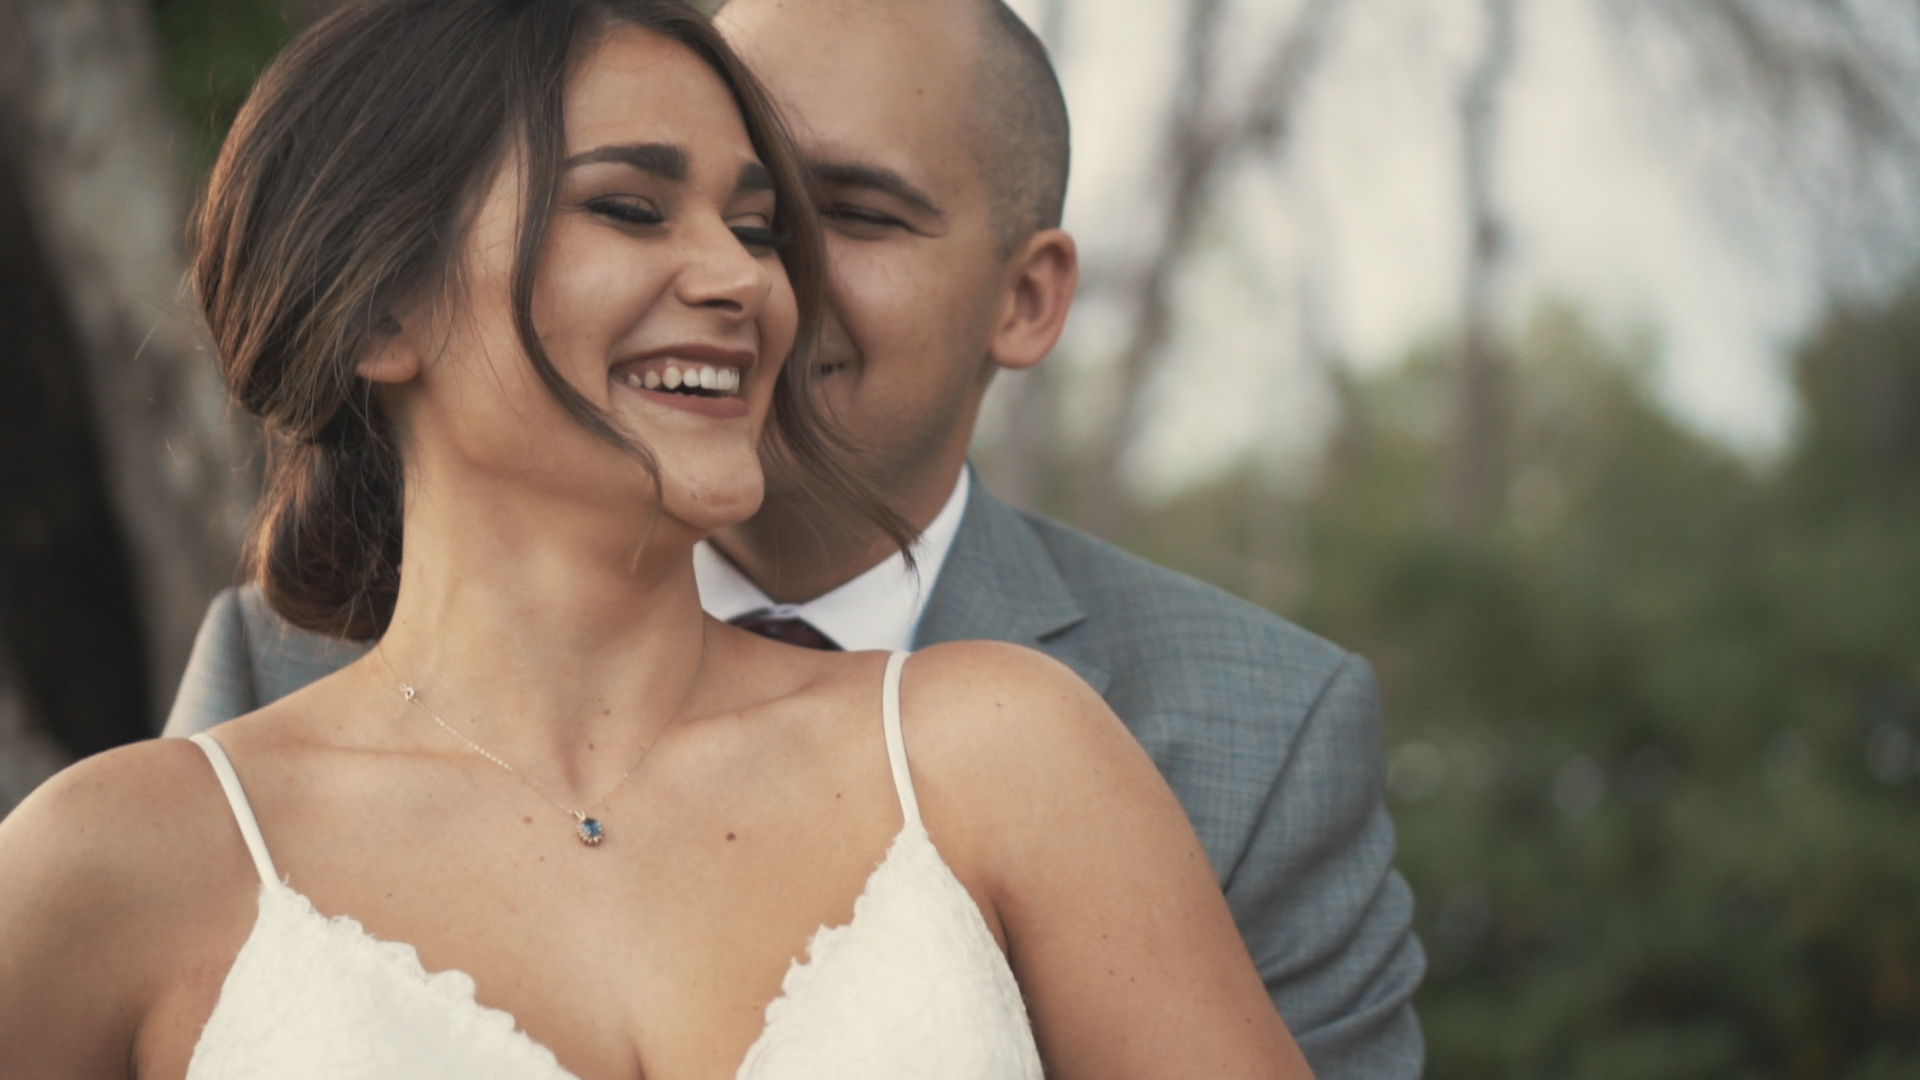 Beautiful bride and groom under umbrella on wedding day - minimalist, artsy shot.